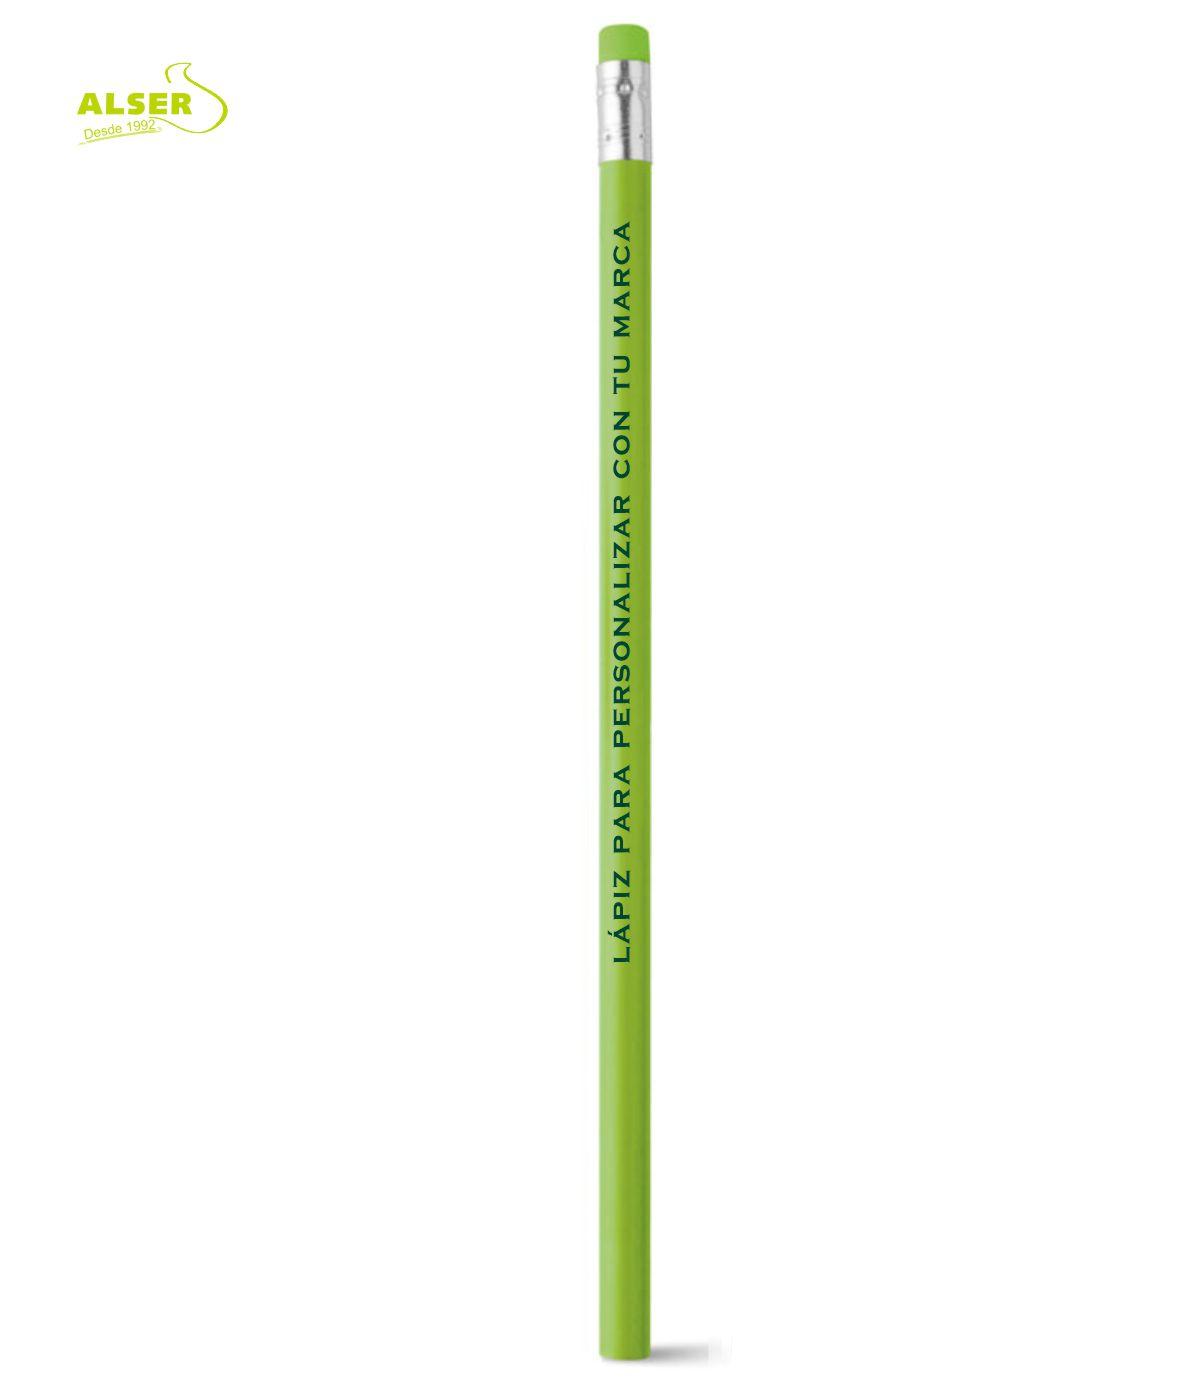 Lapiz publicitario para personalizar Verde Claro